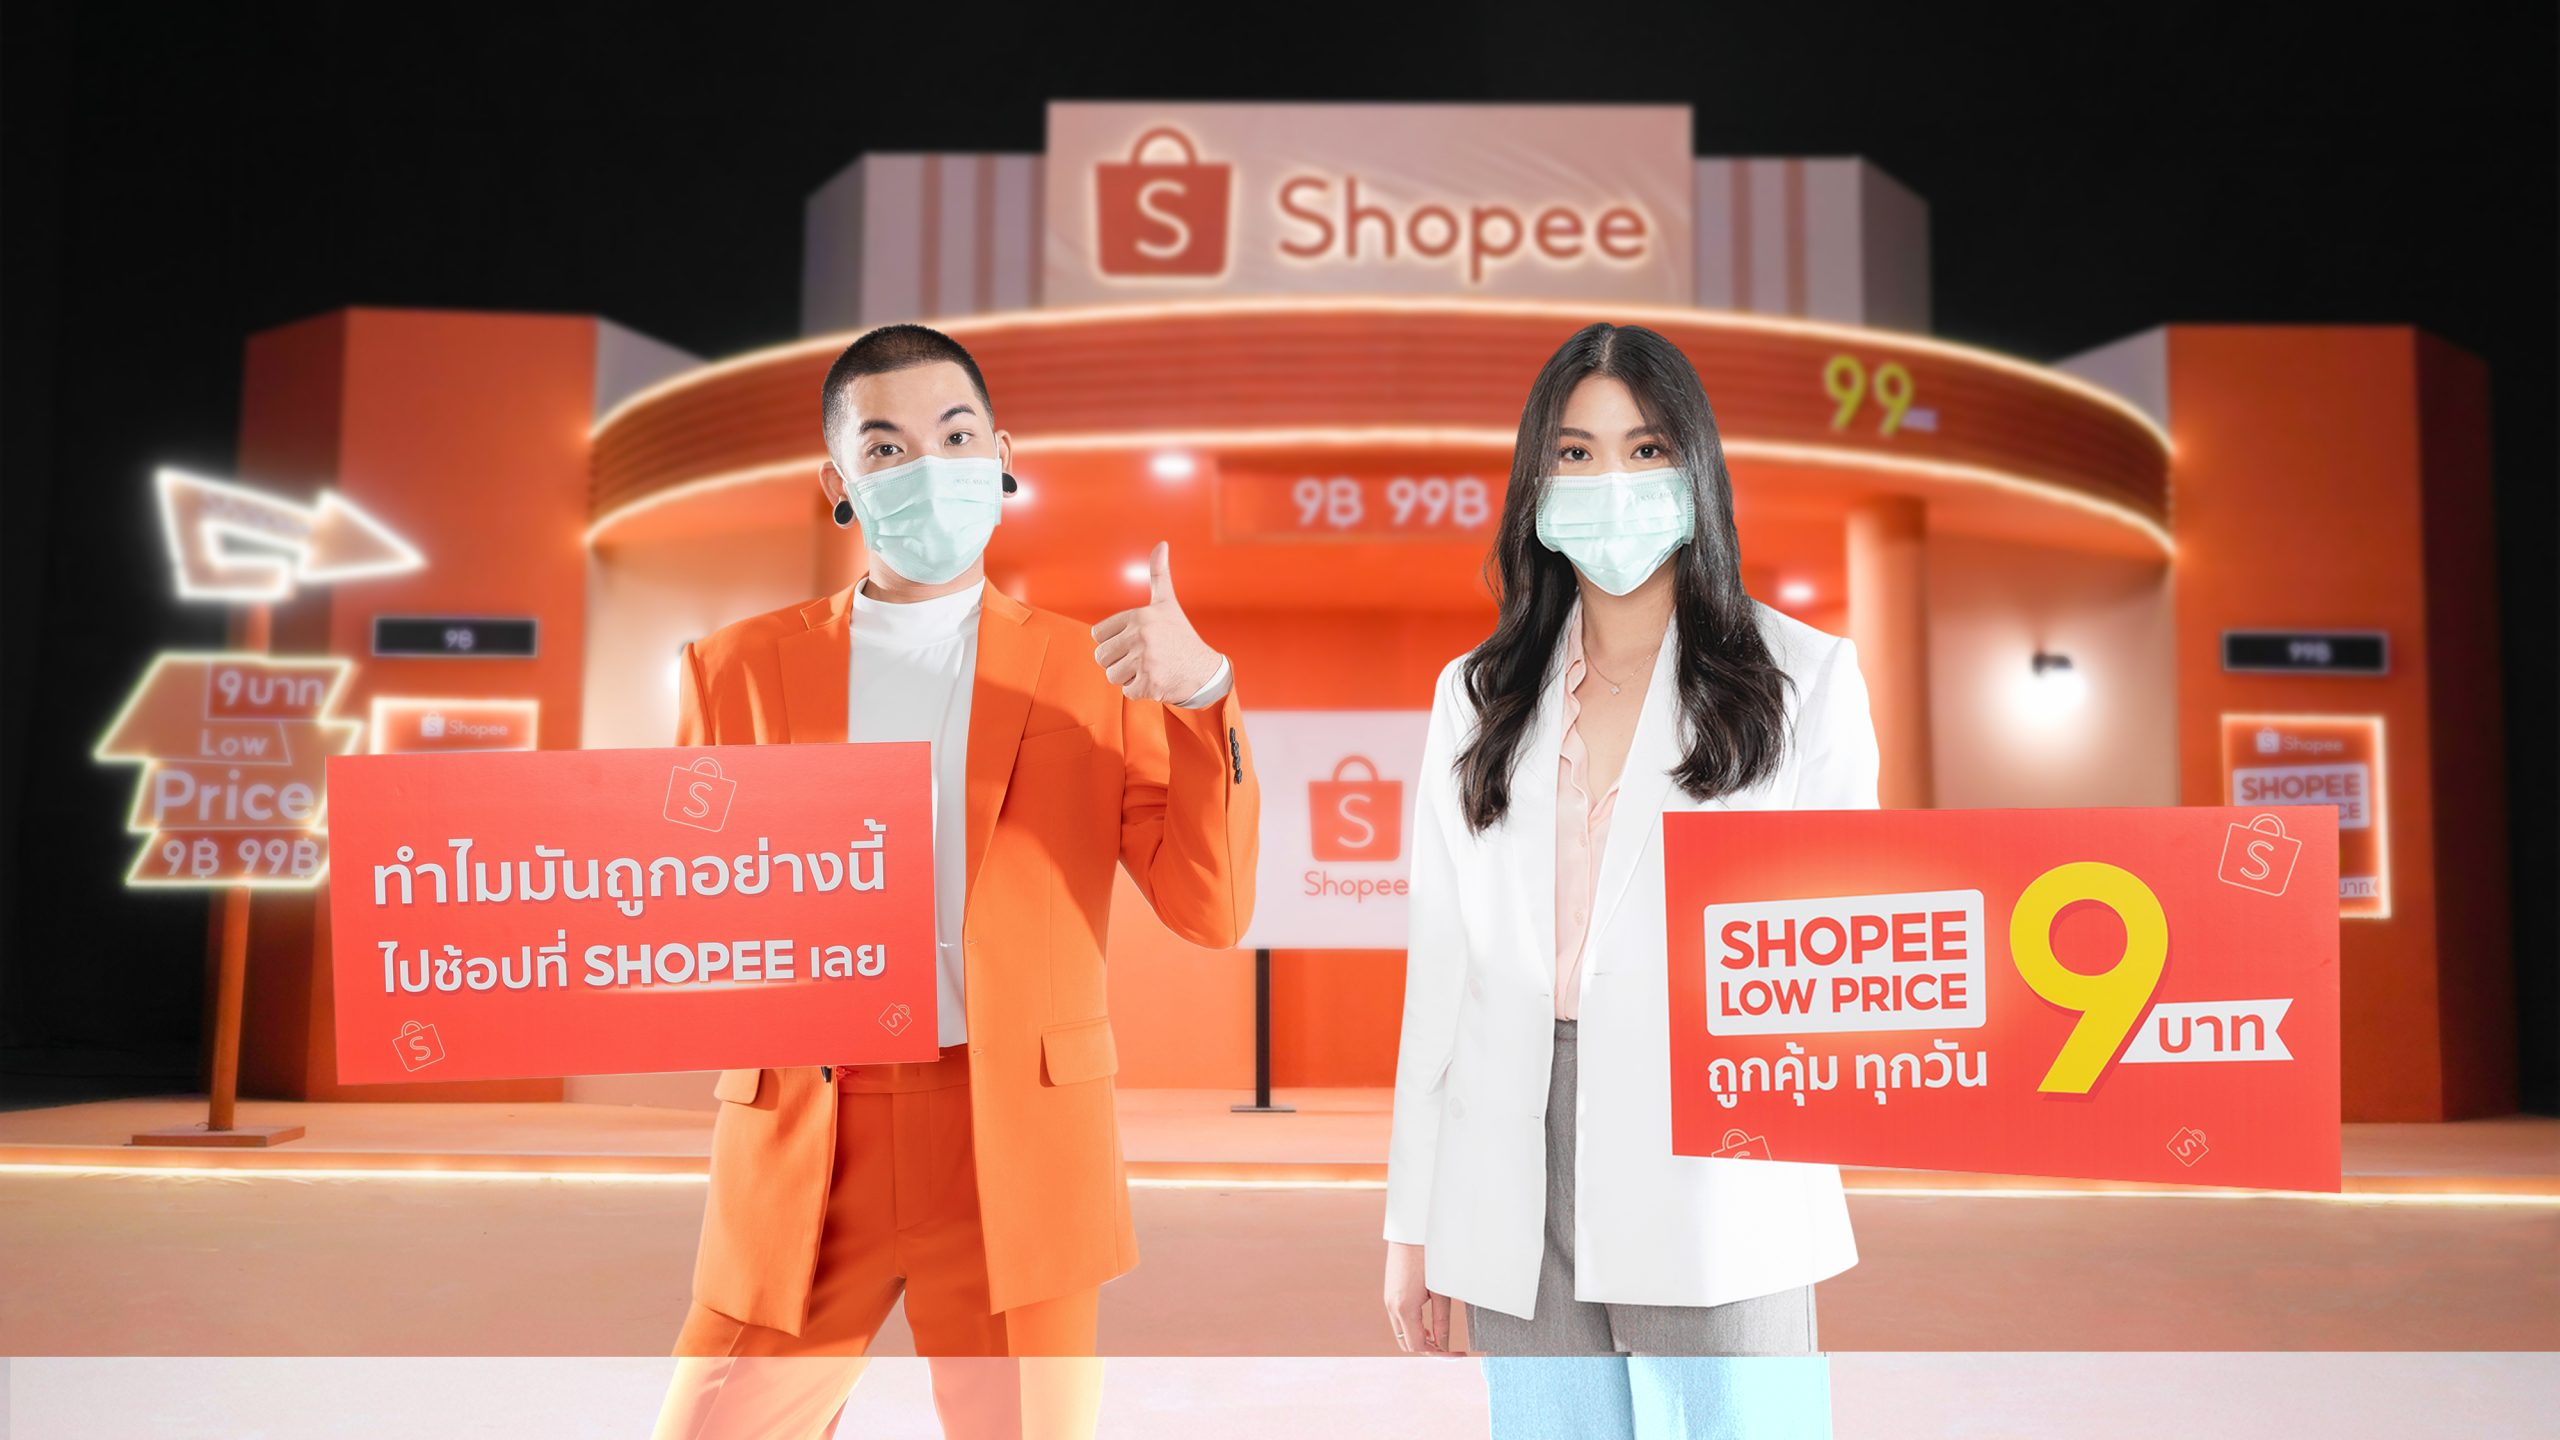 Shopee Shopee Low Price 9 บาท ถูกคุ้ม ทุกวัน